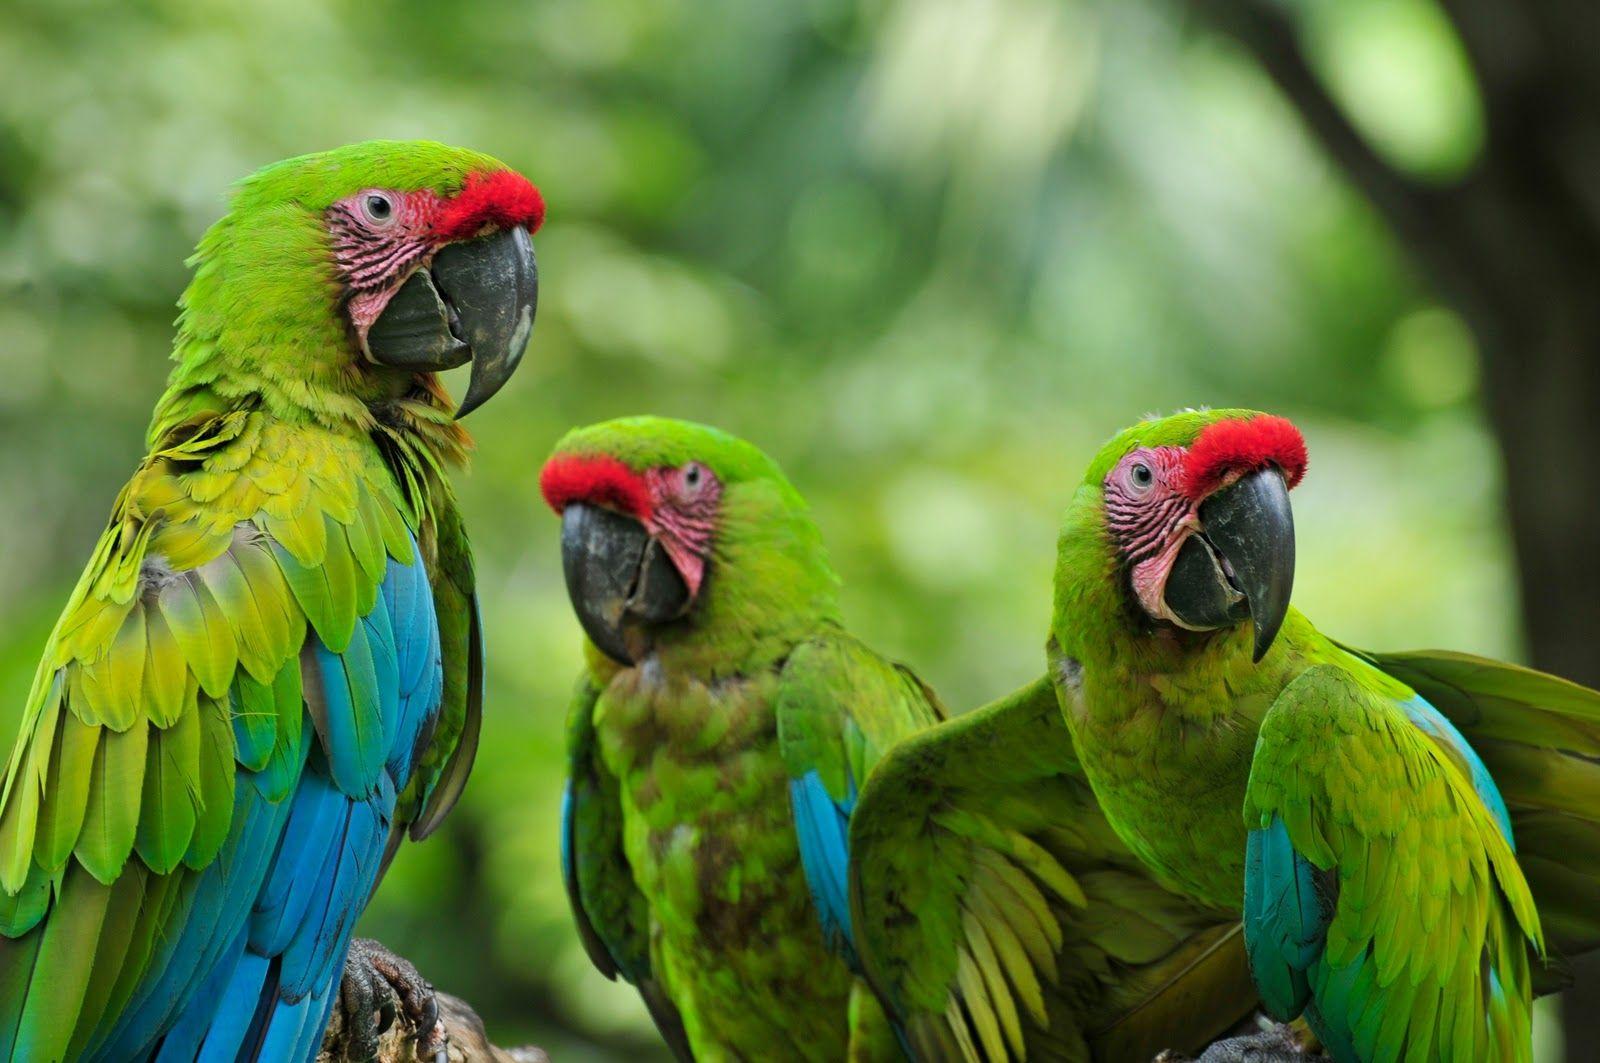 rainforest+animals Costa Rica's Tropical Rainforest